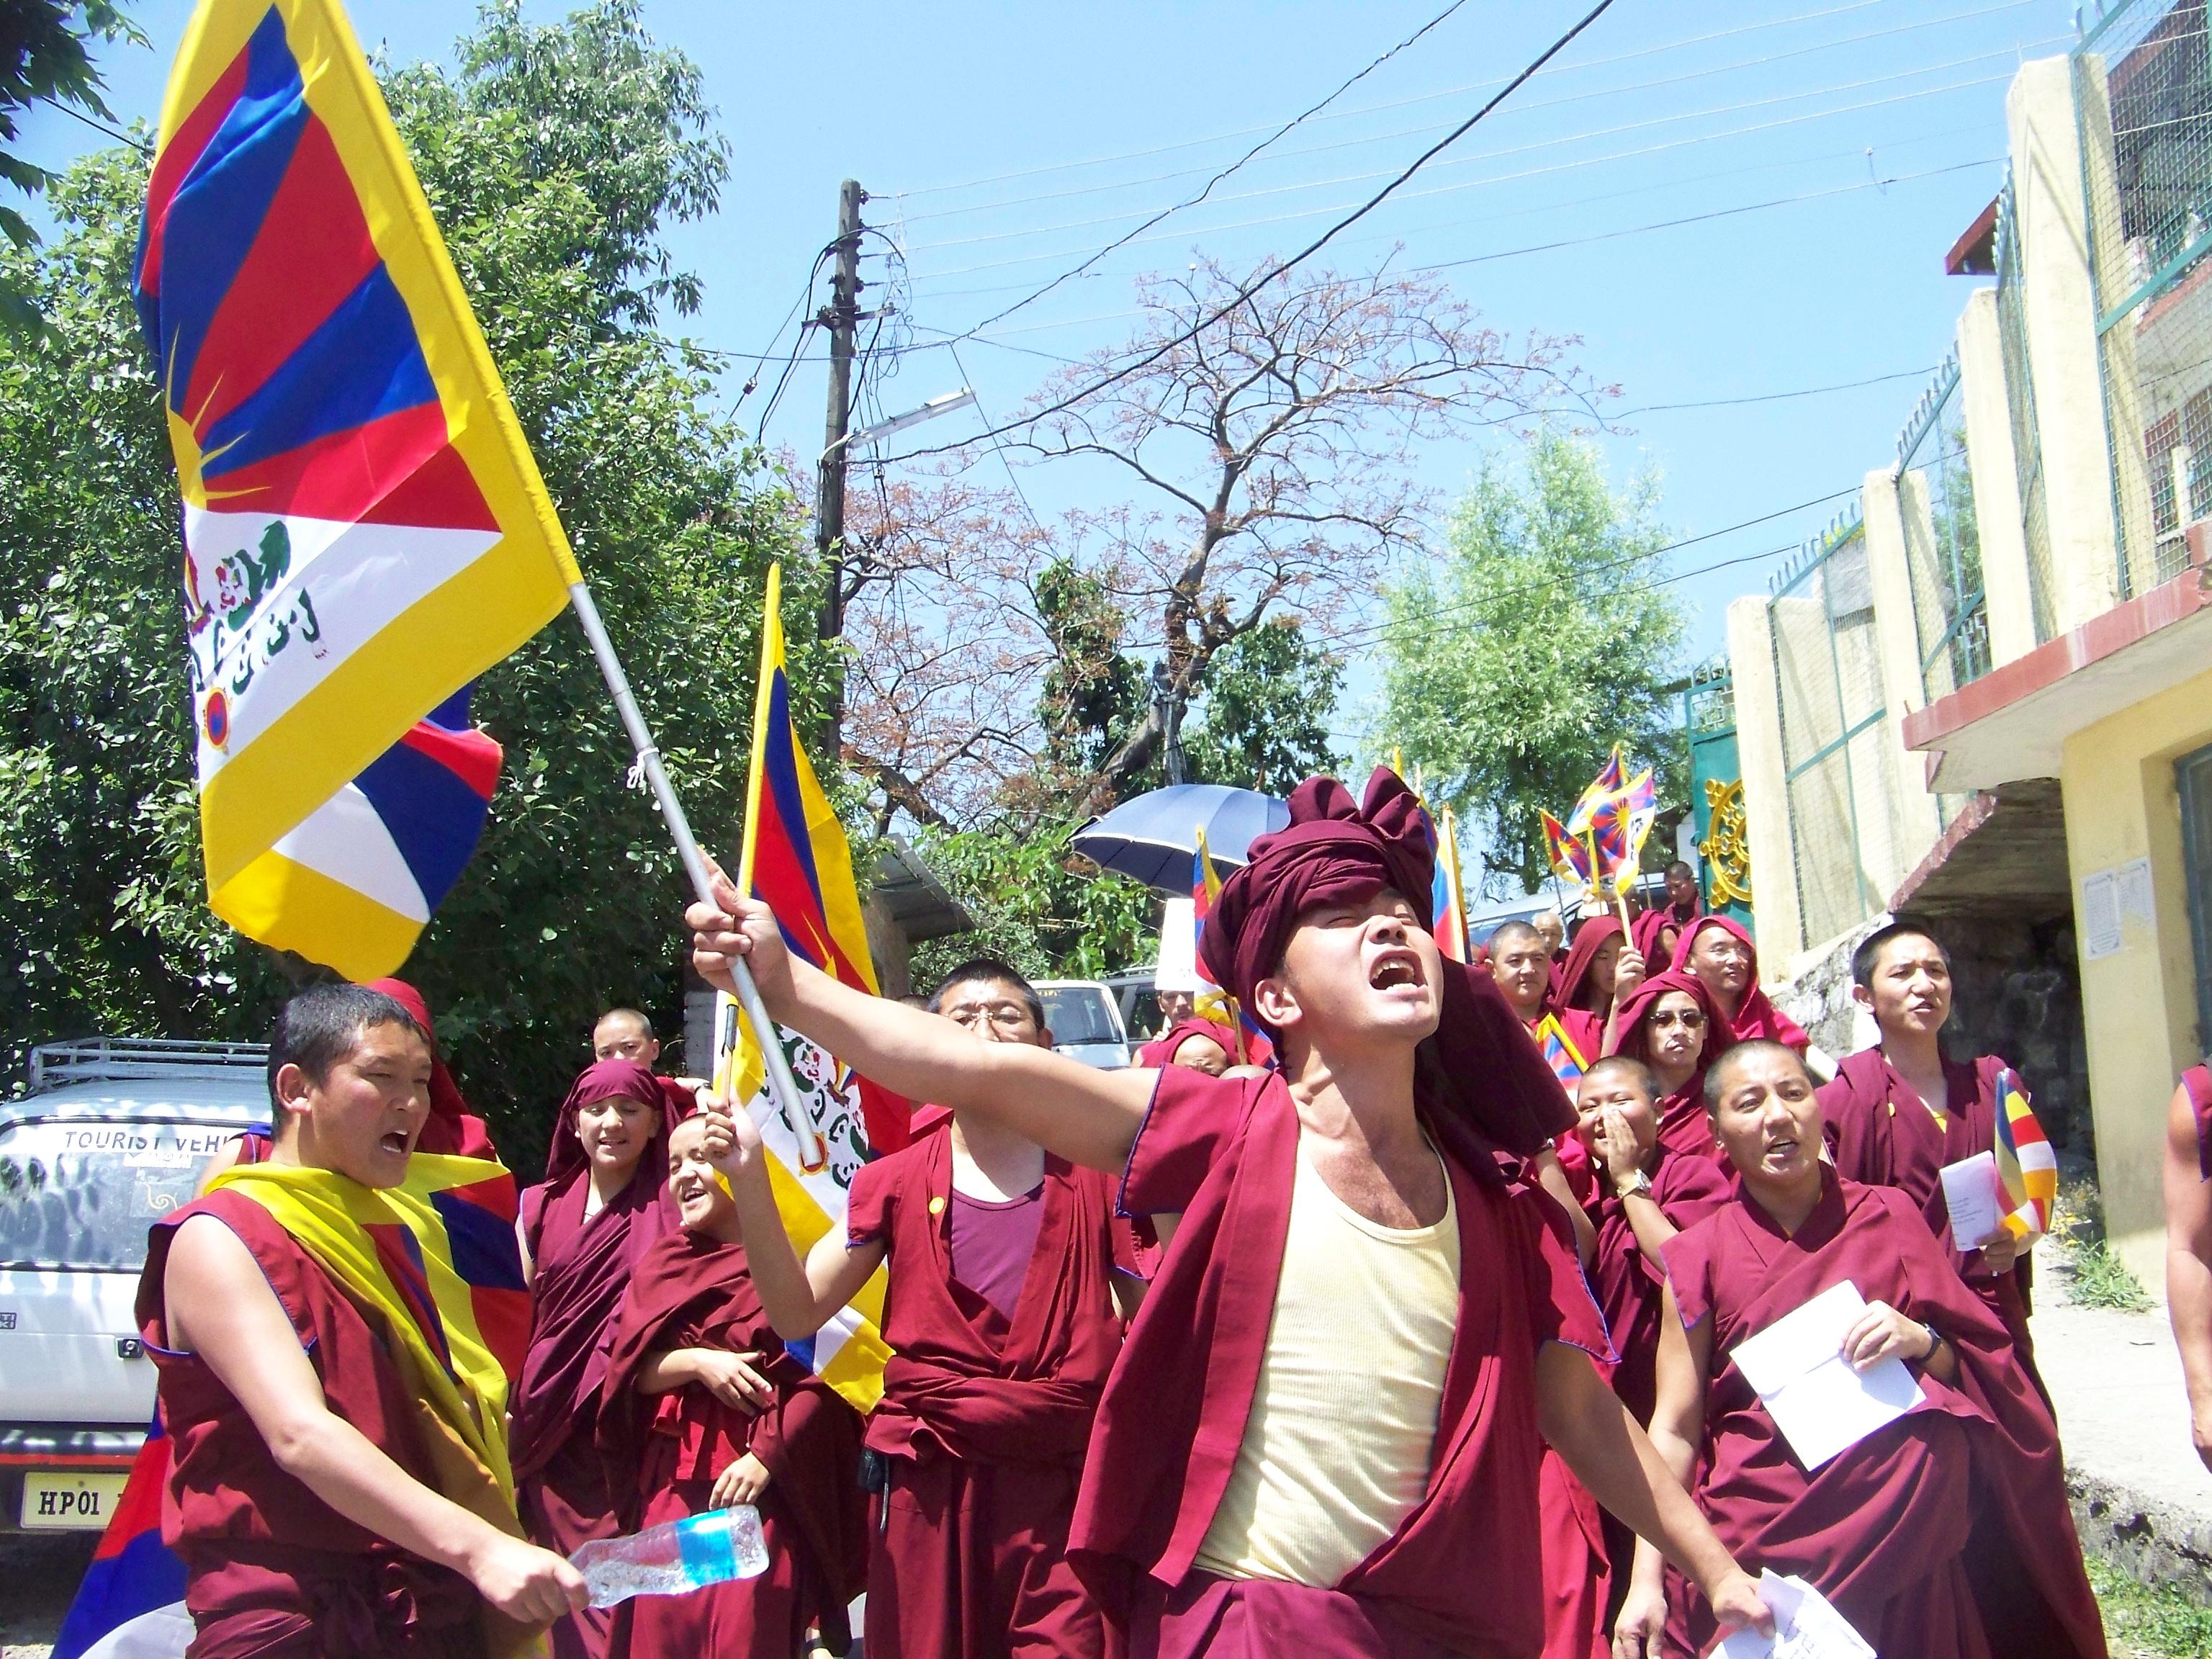 100_3251 Jonathan Machler, Tibétains à Dharamsala, Copyright